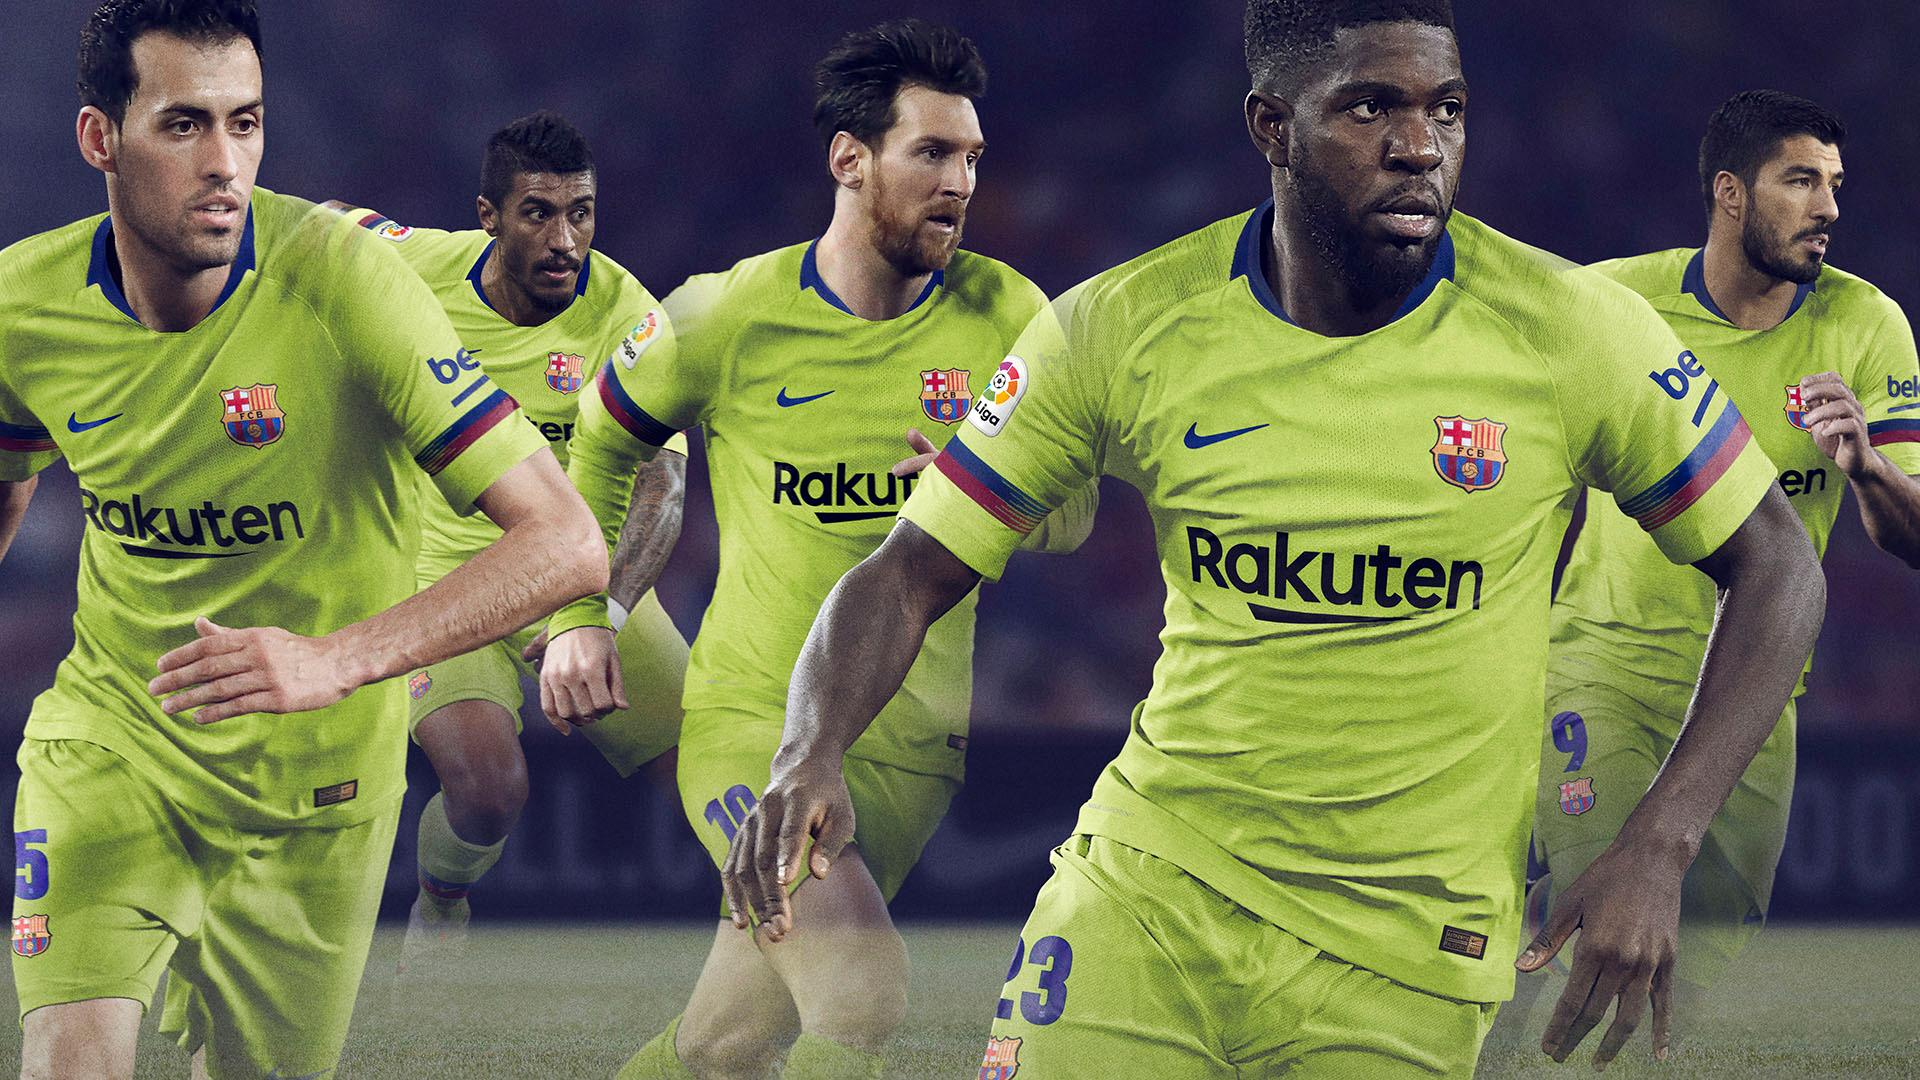 Fc Barcelona To Wear Yellow Away Kit In 2018 19